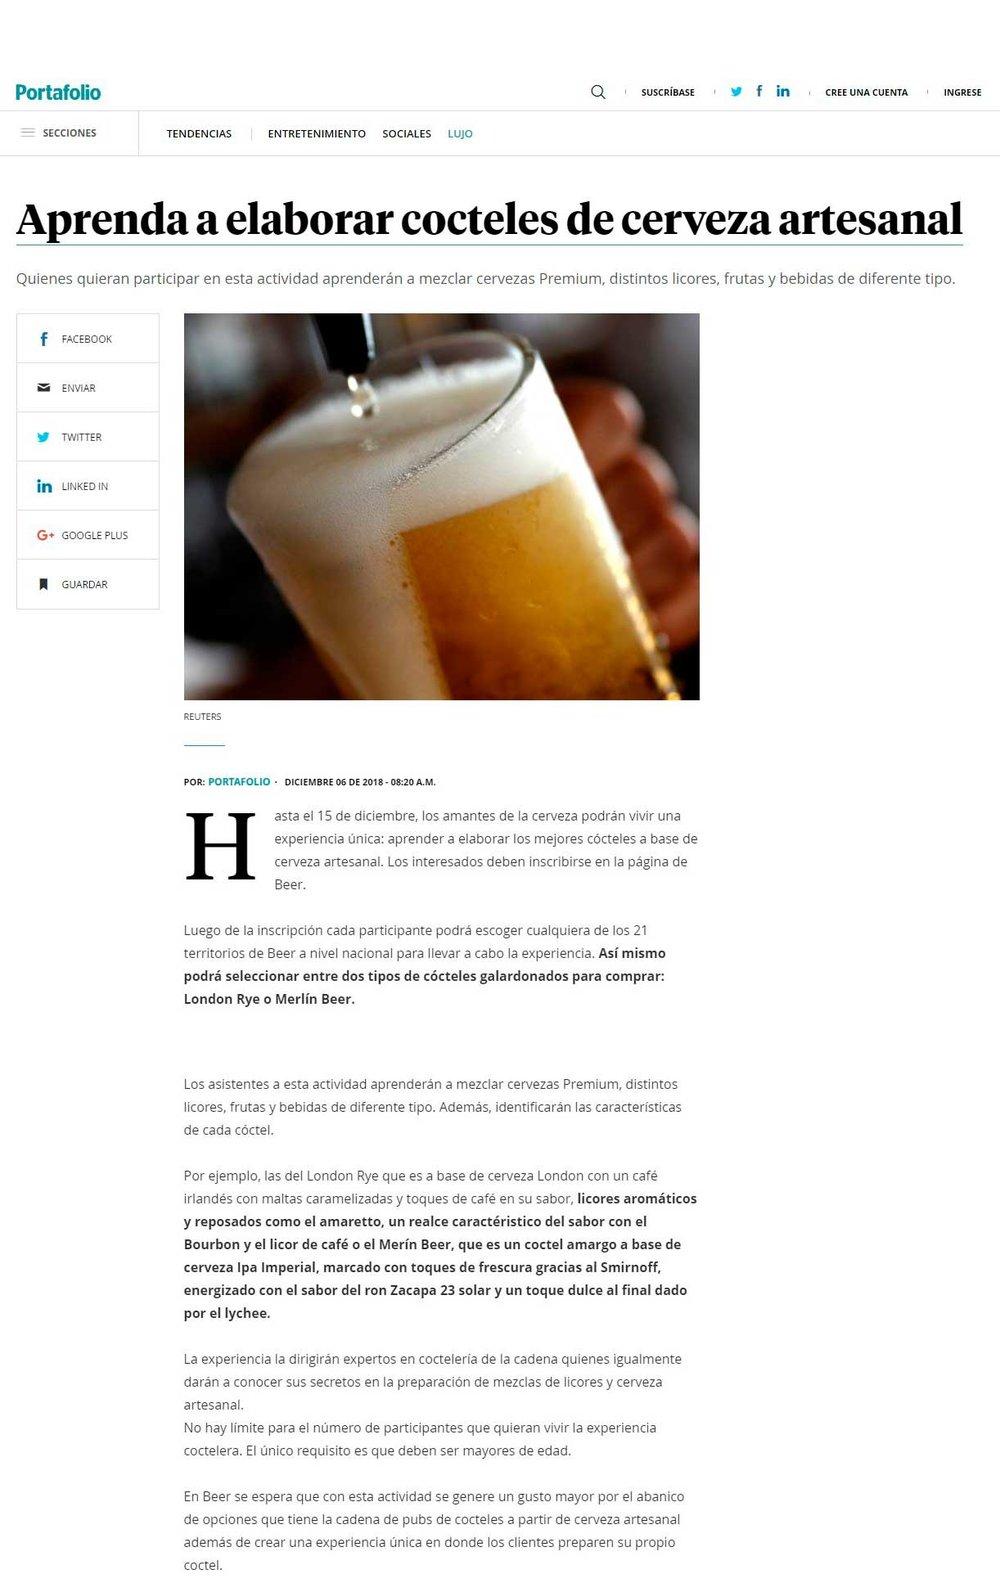 REPORTAJE-PORTAFOLIO.jpg